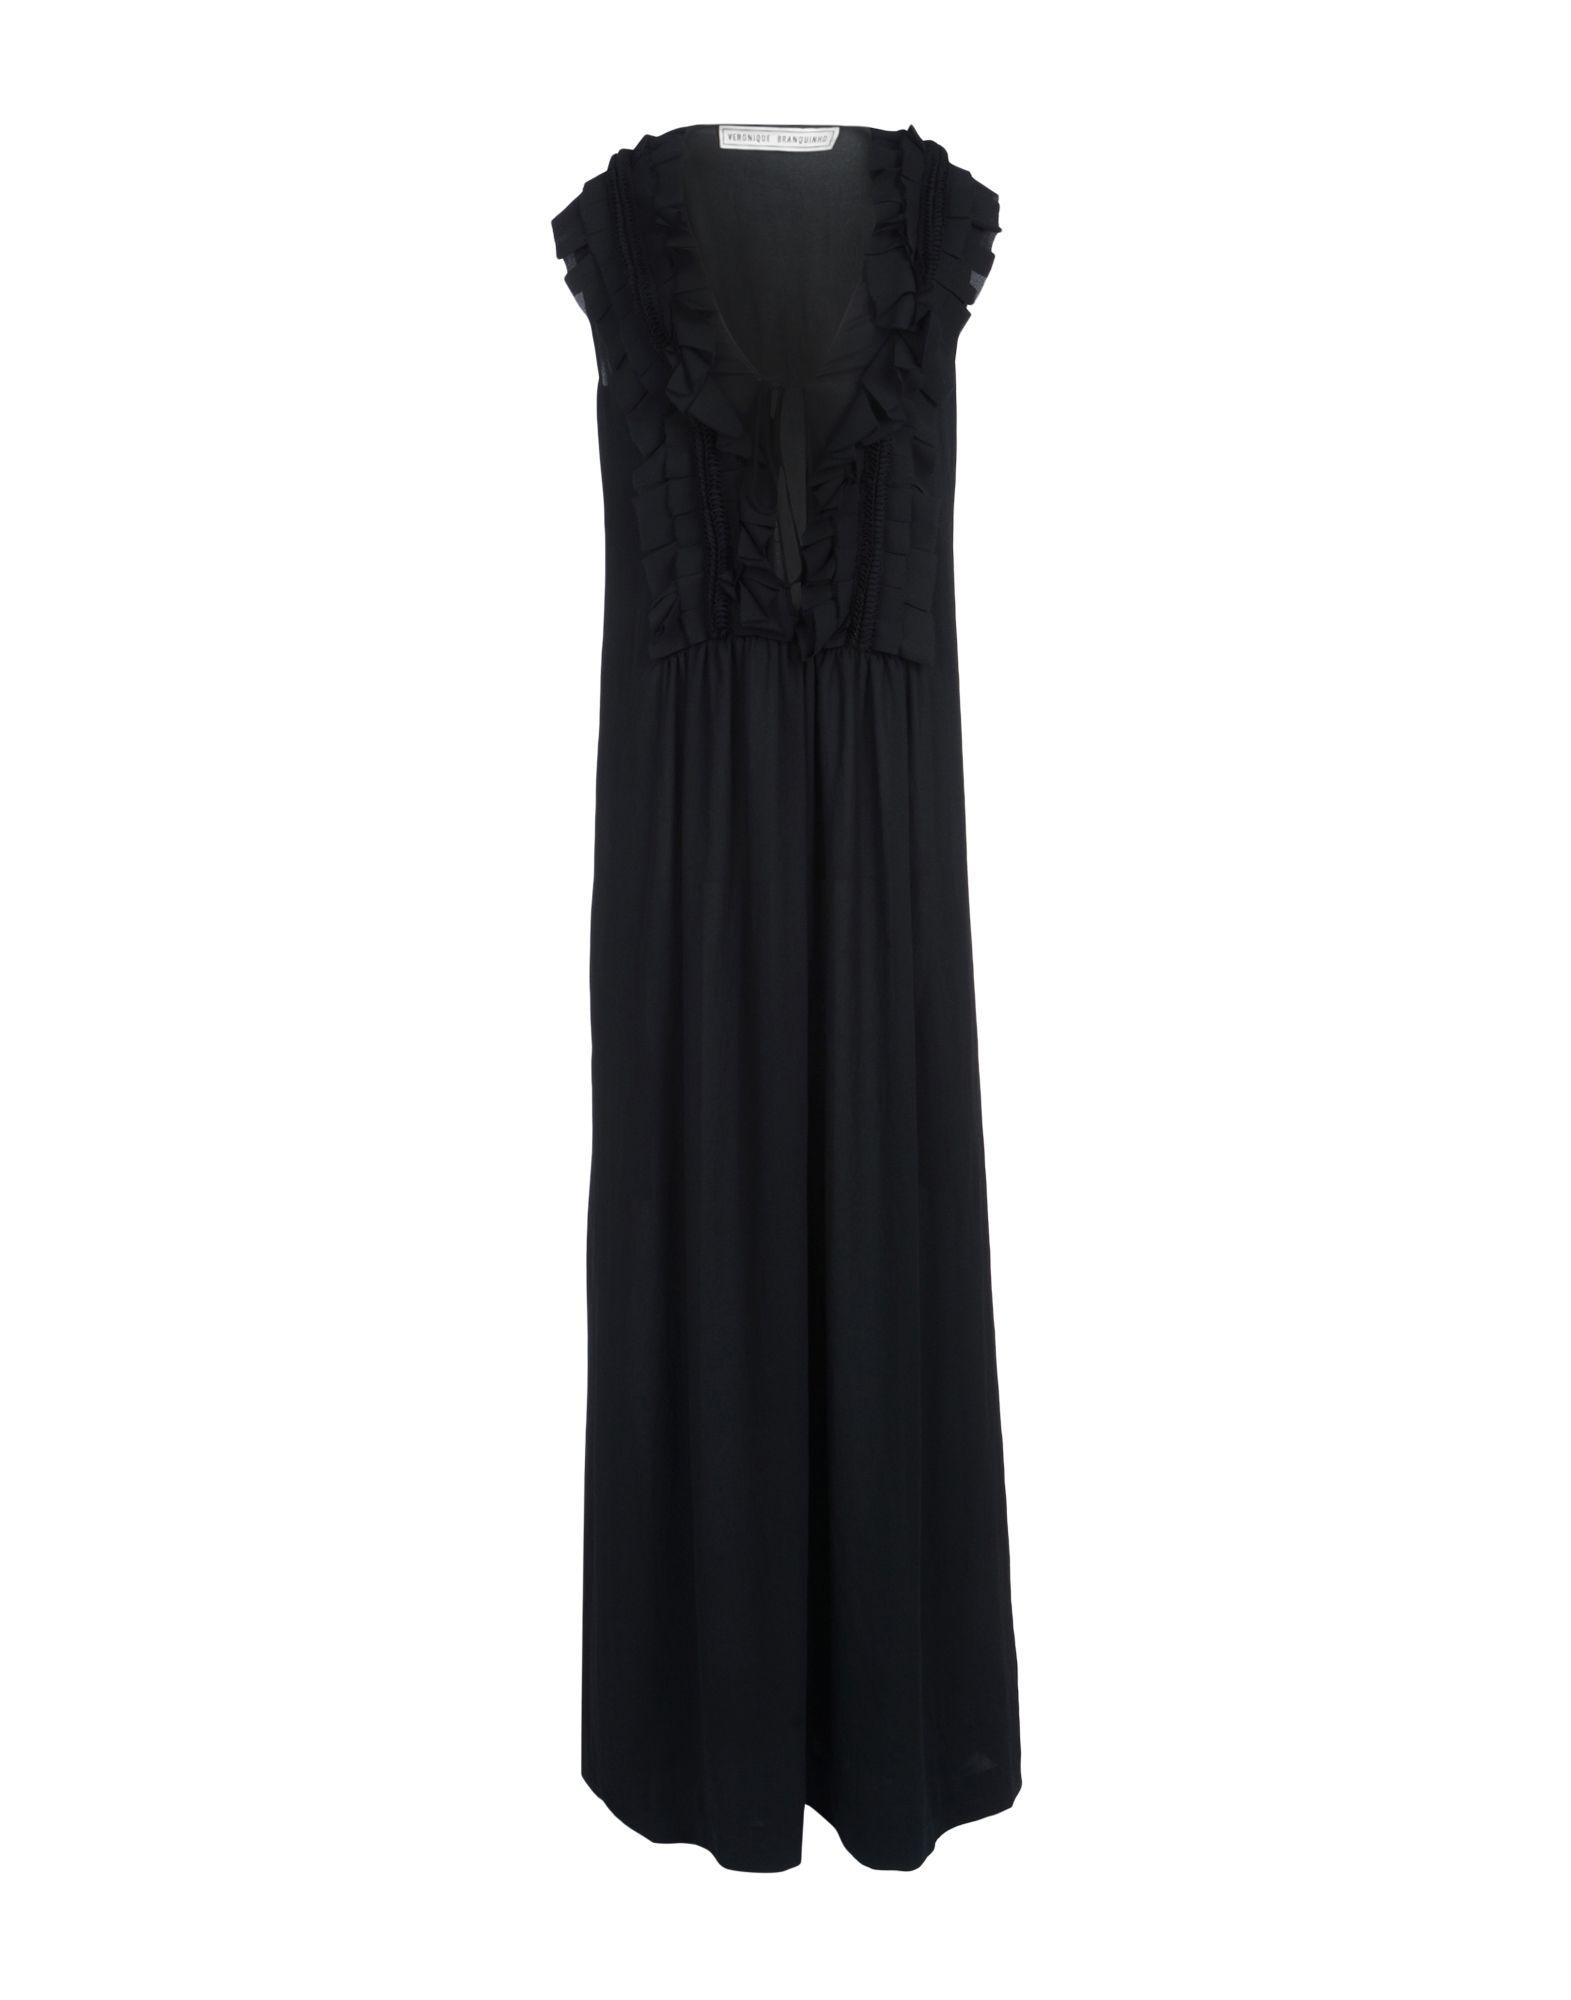 VERONIQUE BRANQUINHO Длинное платье veronique branquinho полусапоги и высокие ботинки page 9